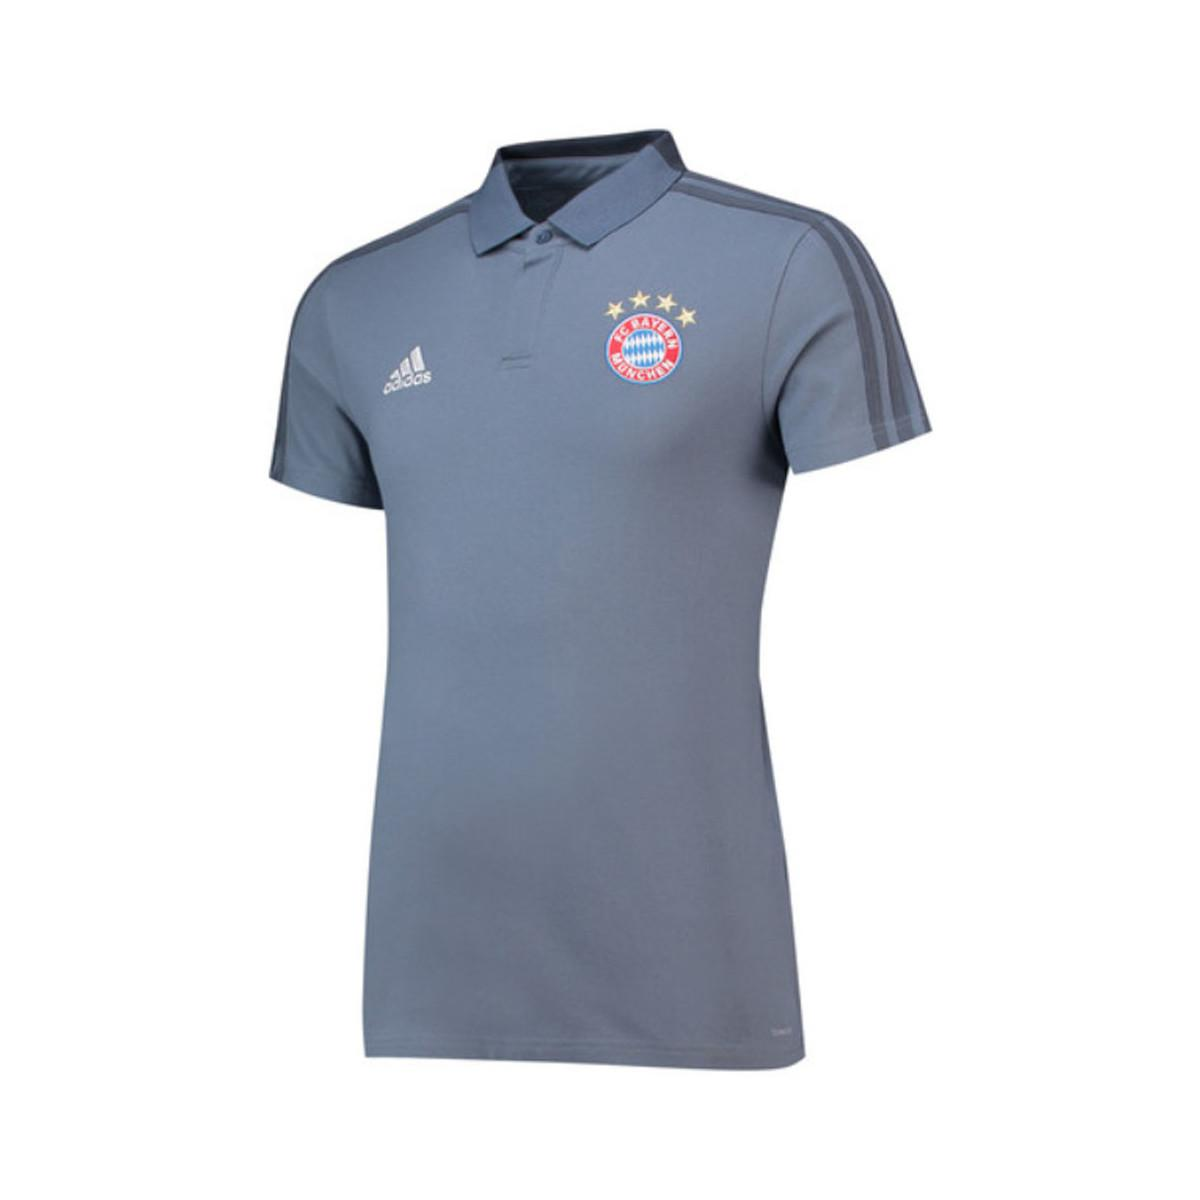 004b1a95d9e5d Adidas Gray 2018-2019 Bayern Munich Ucl Training Polo Shirt Men's Polo  Shirt In Grey for men